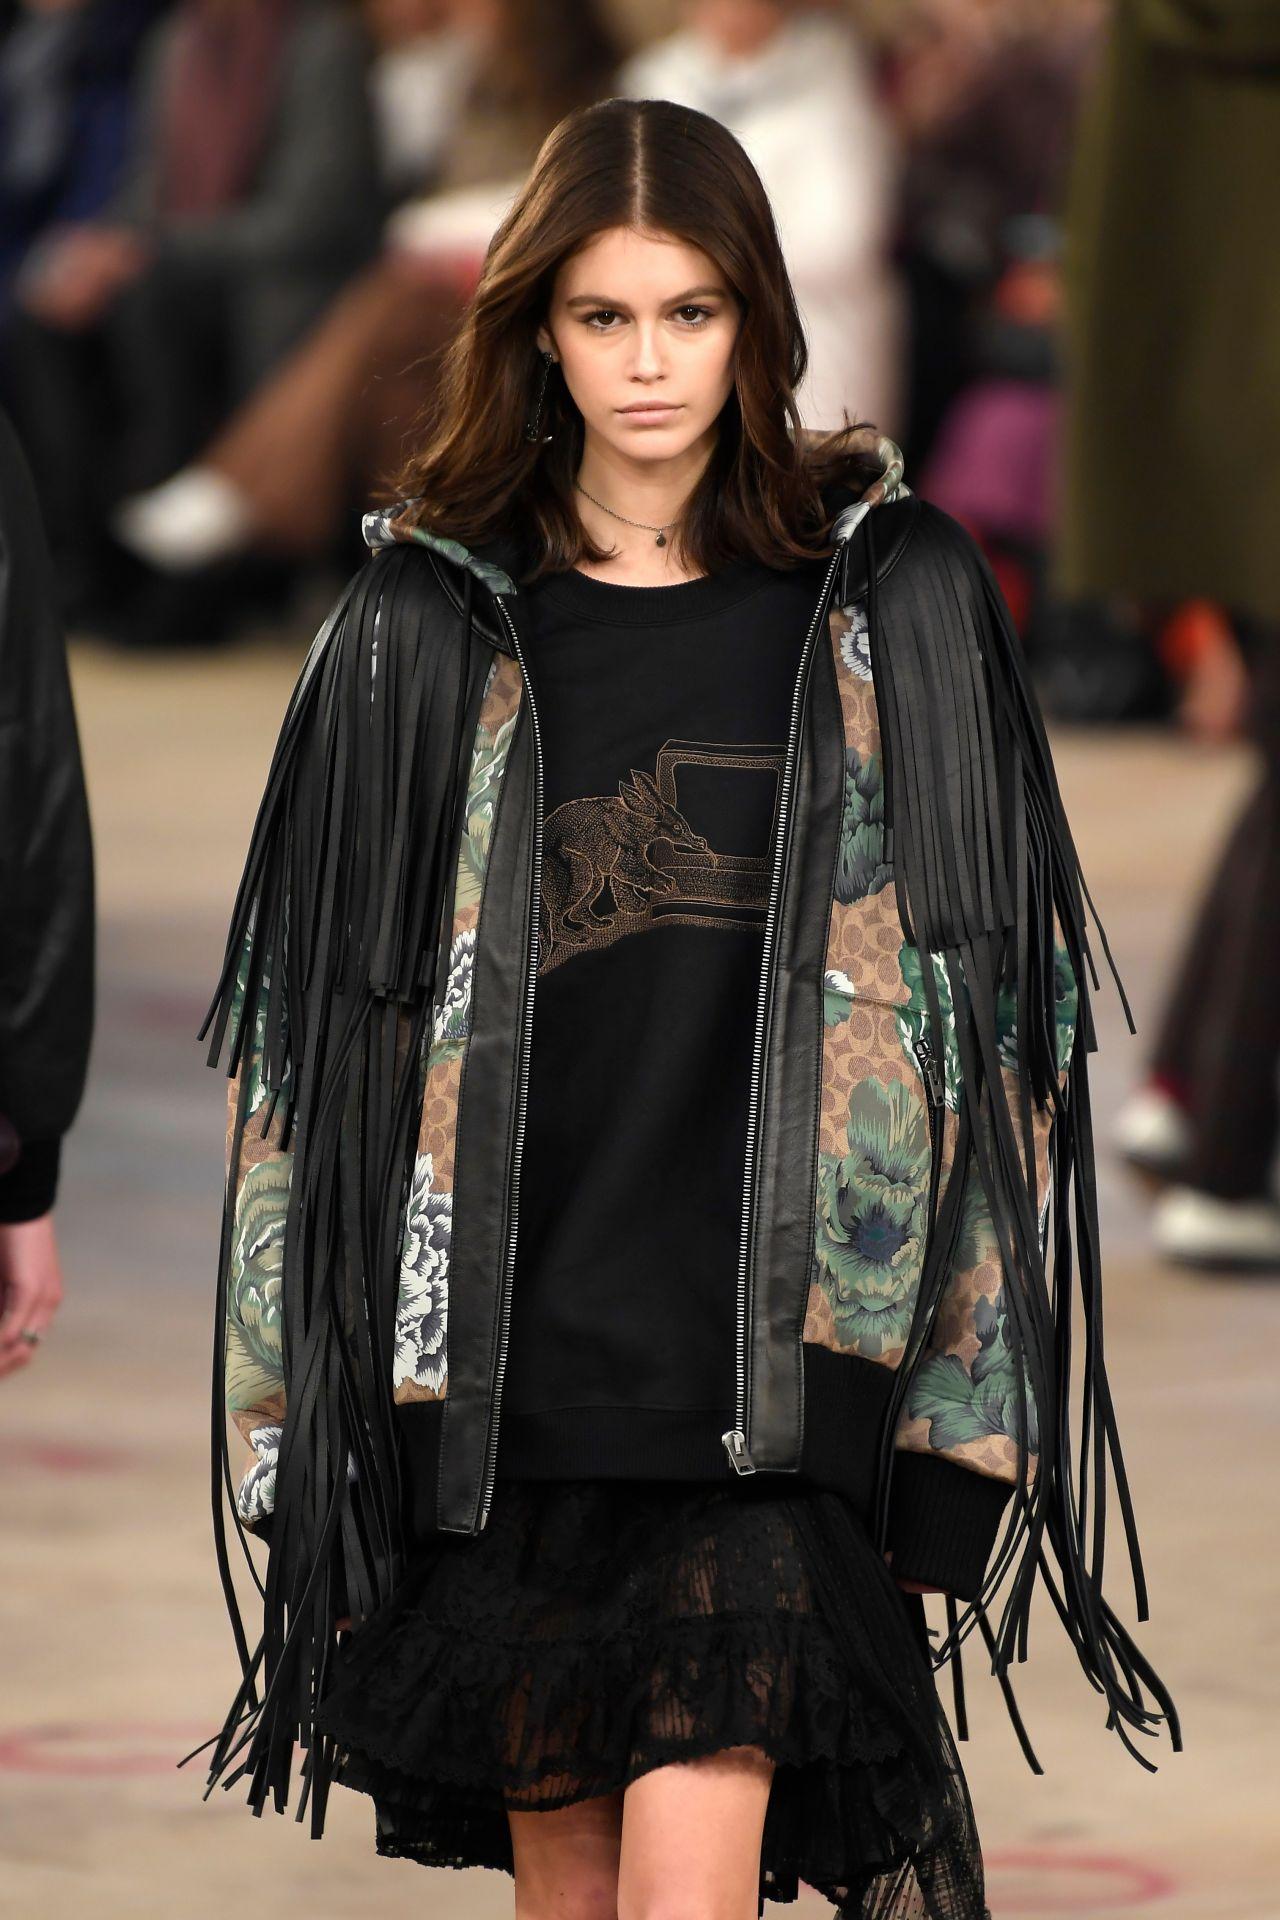 Kaia Gerber Walks Coach Fashion Show in New York 02/12/2019